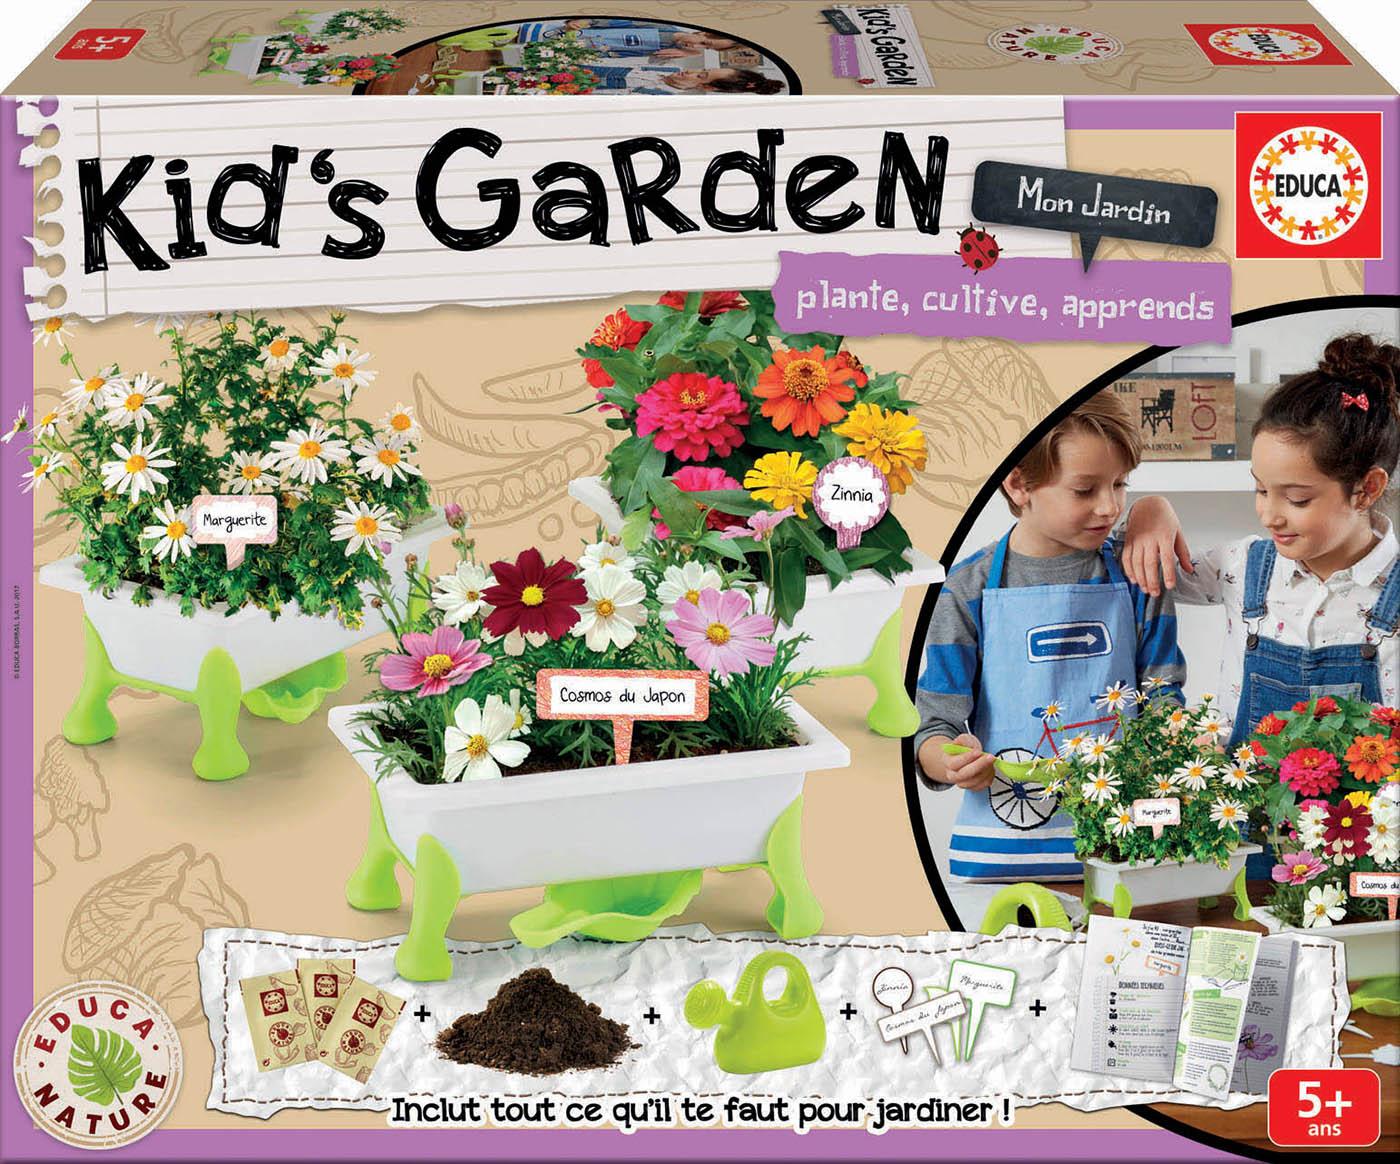 Kid's Garden : Fleurs : Marguerites + Zinias + Cosmos